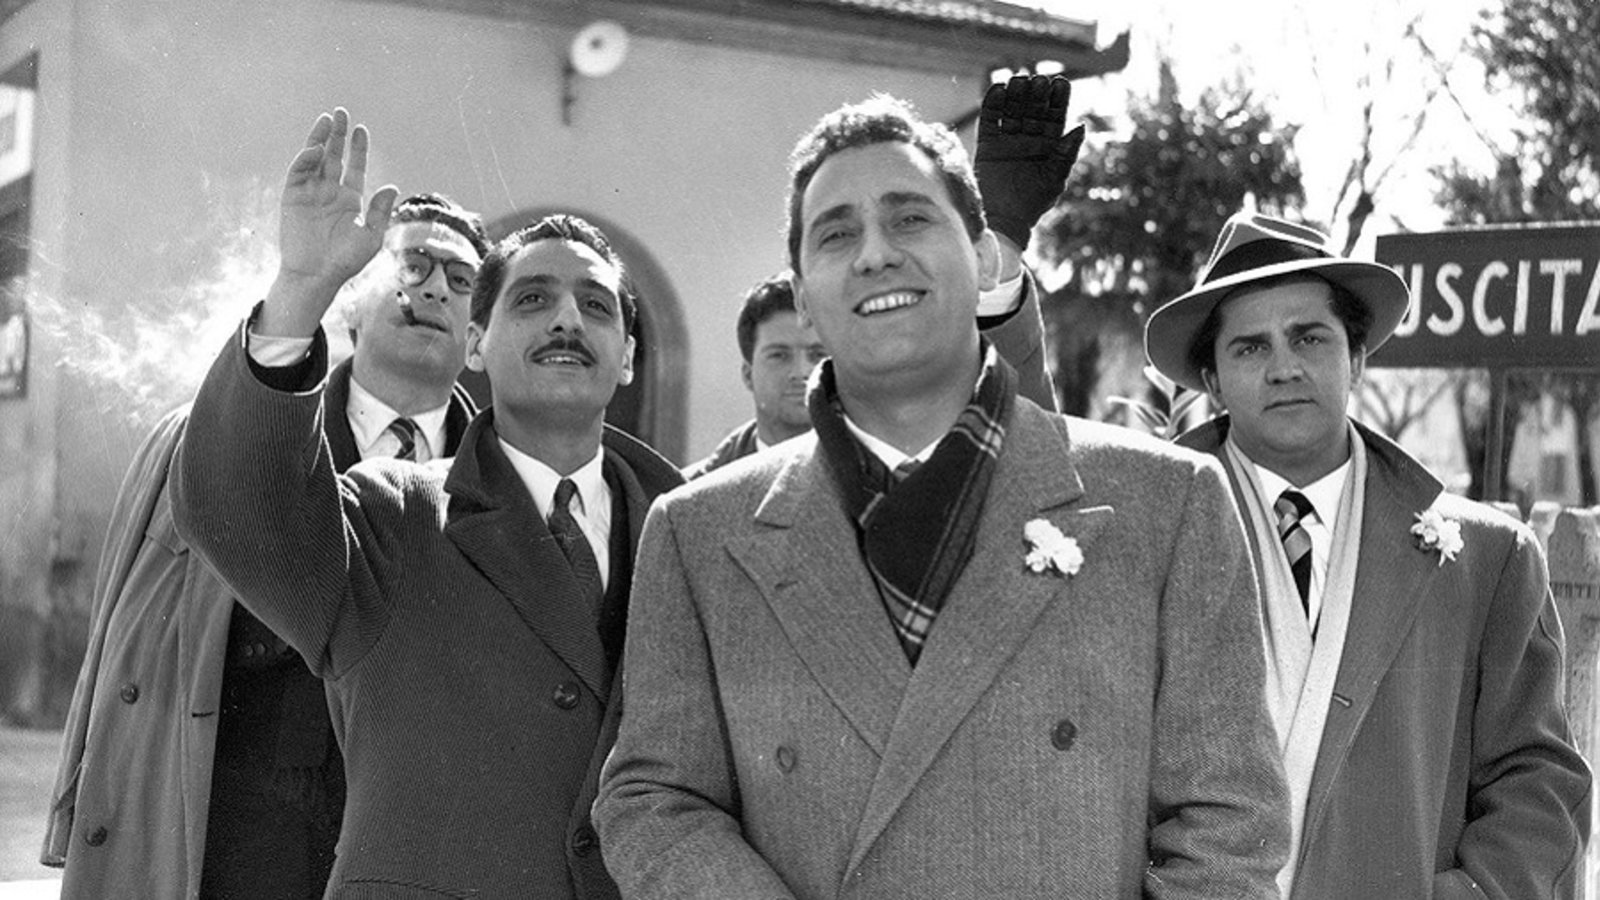 A Movie a Day, Day 90: Federico Fellini's I Vitelloni